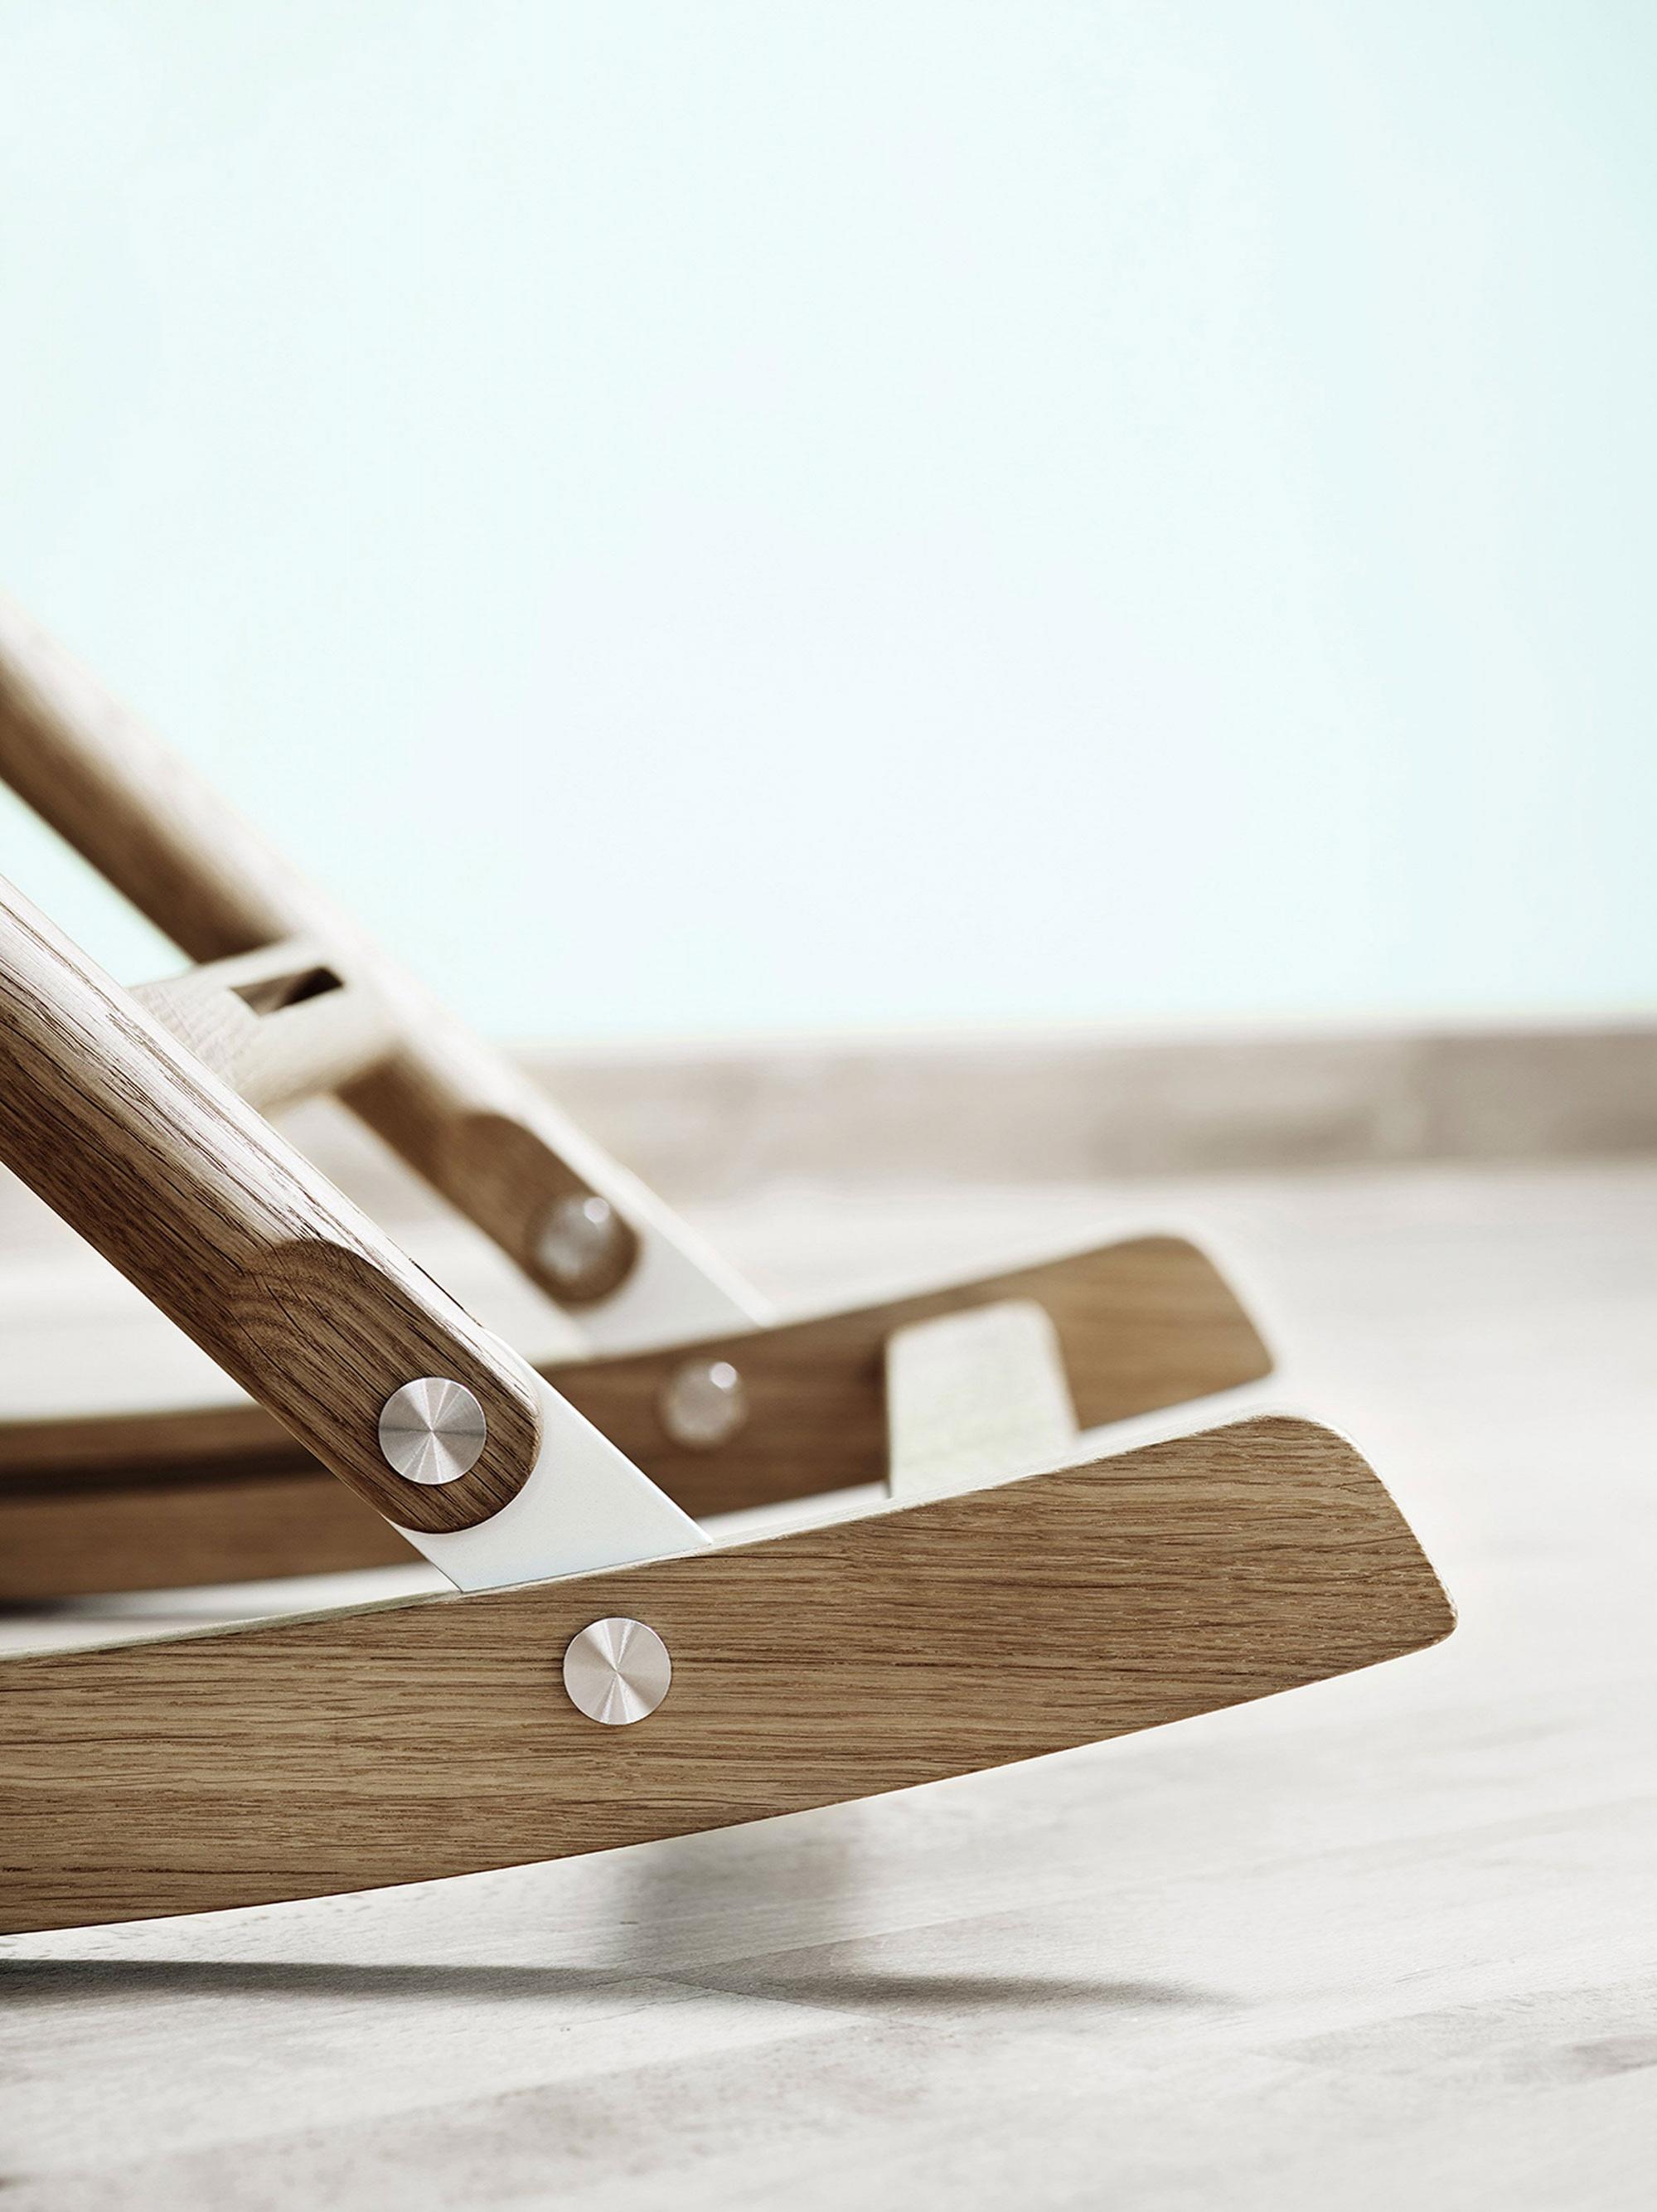 rocking-chair-anker-bak-carl-hansen-gessato-5